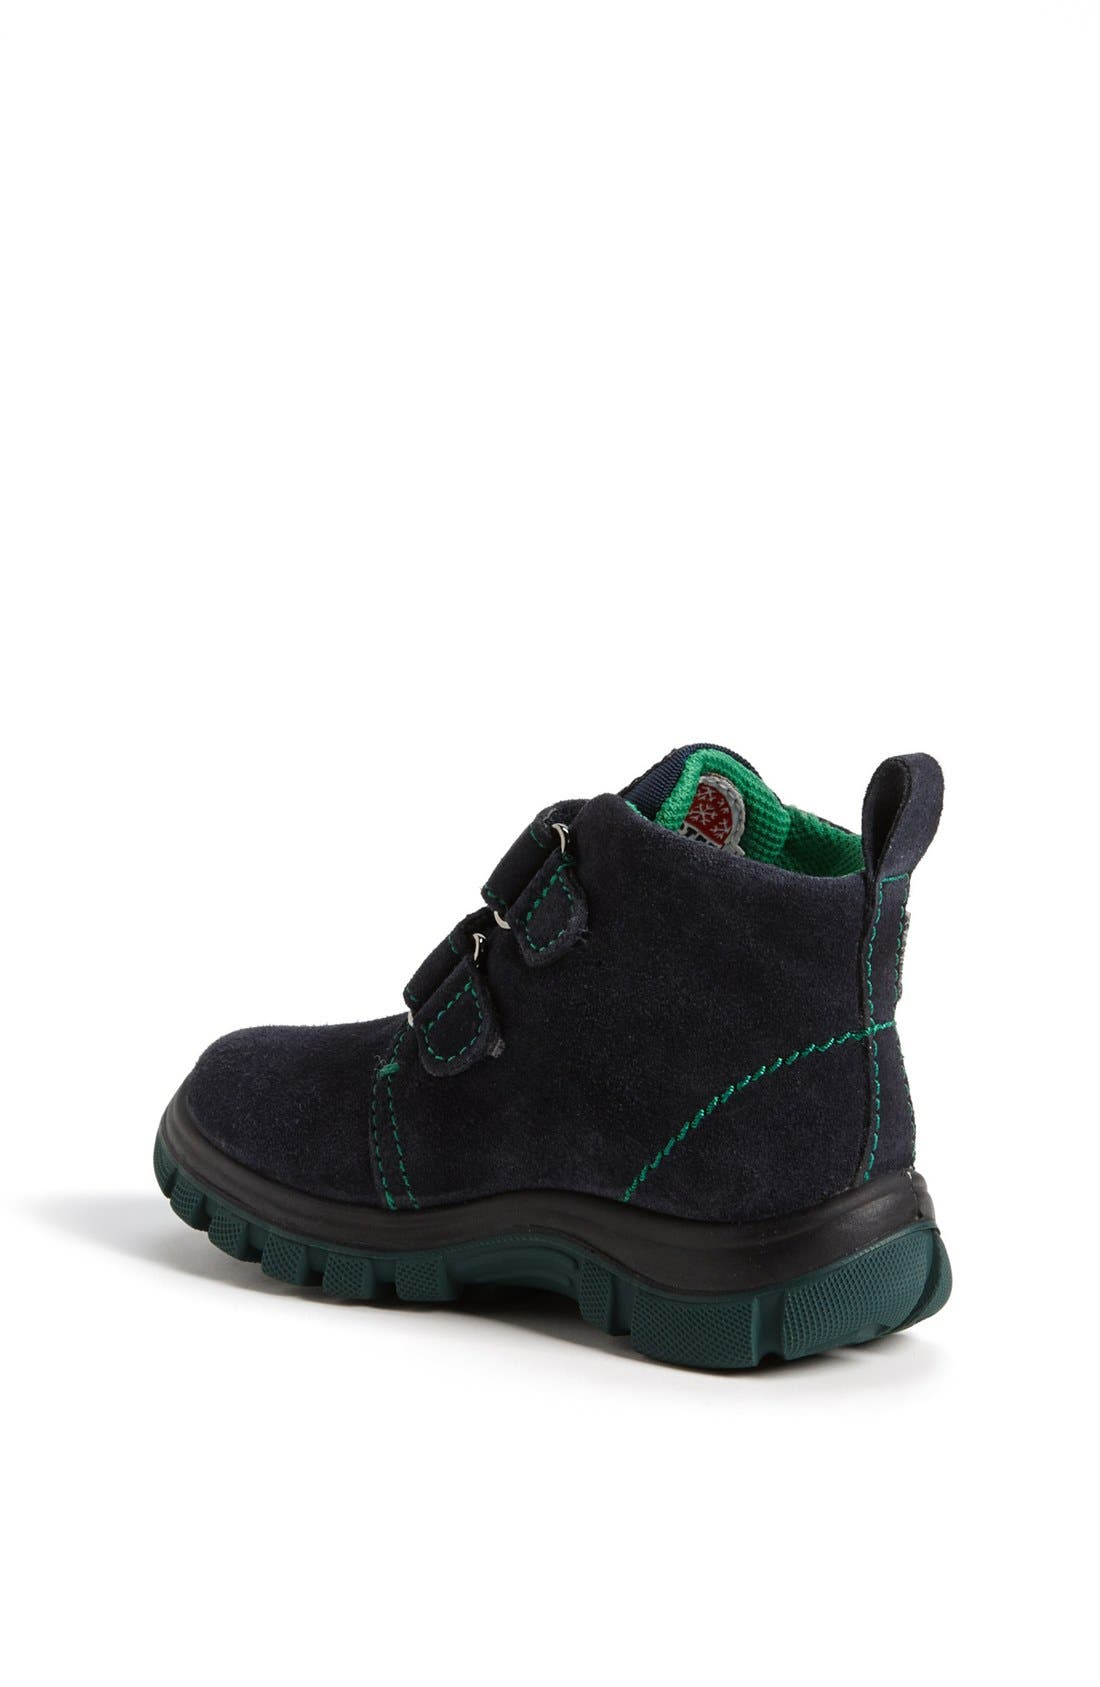 Alternate Image 2  - Naturino 'Bakutis Rainstep' Waterproof Boot (Walker, Toddler & Little Kid)